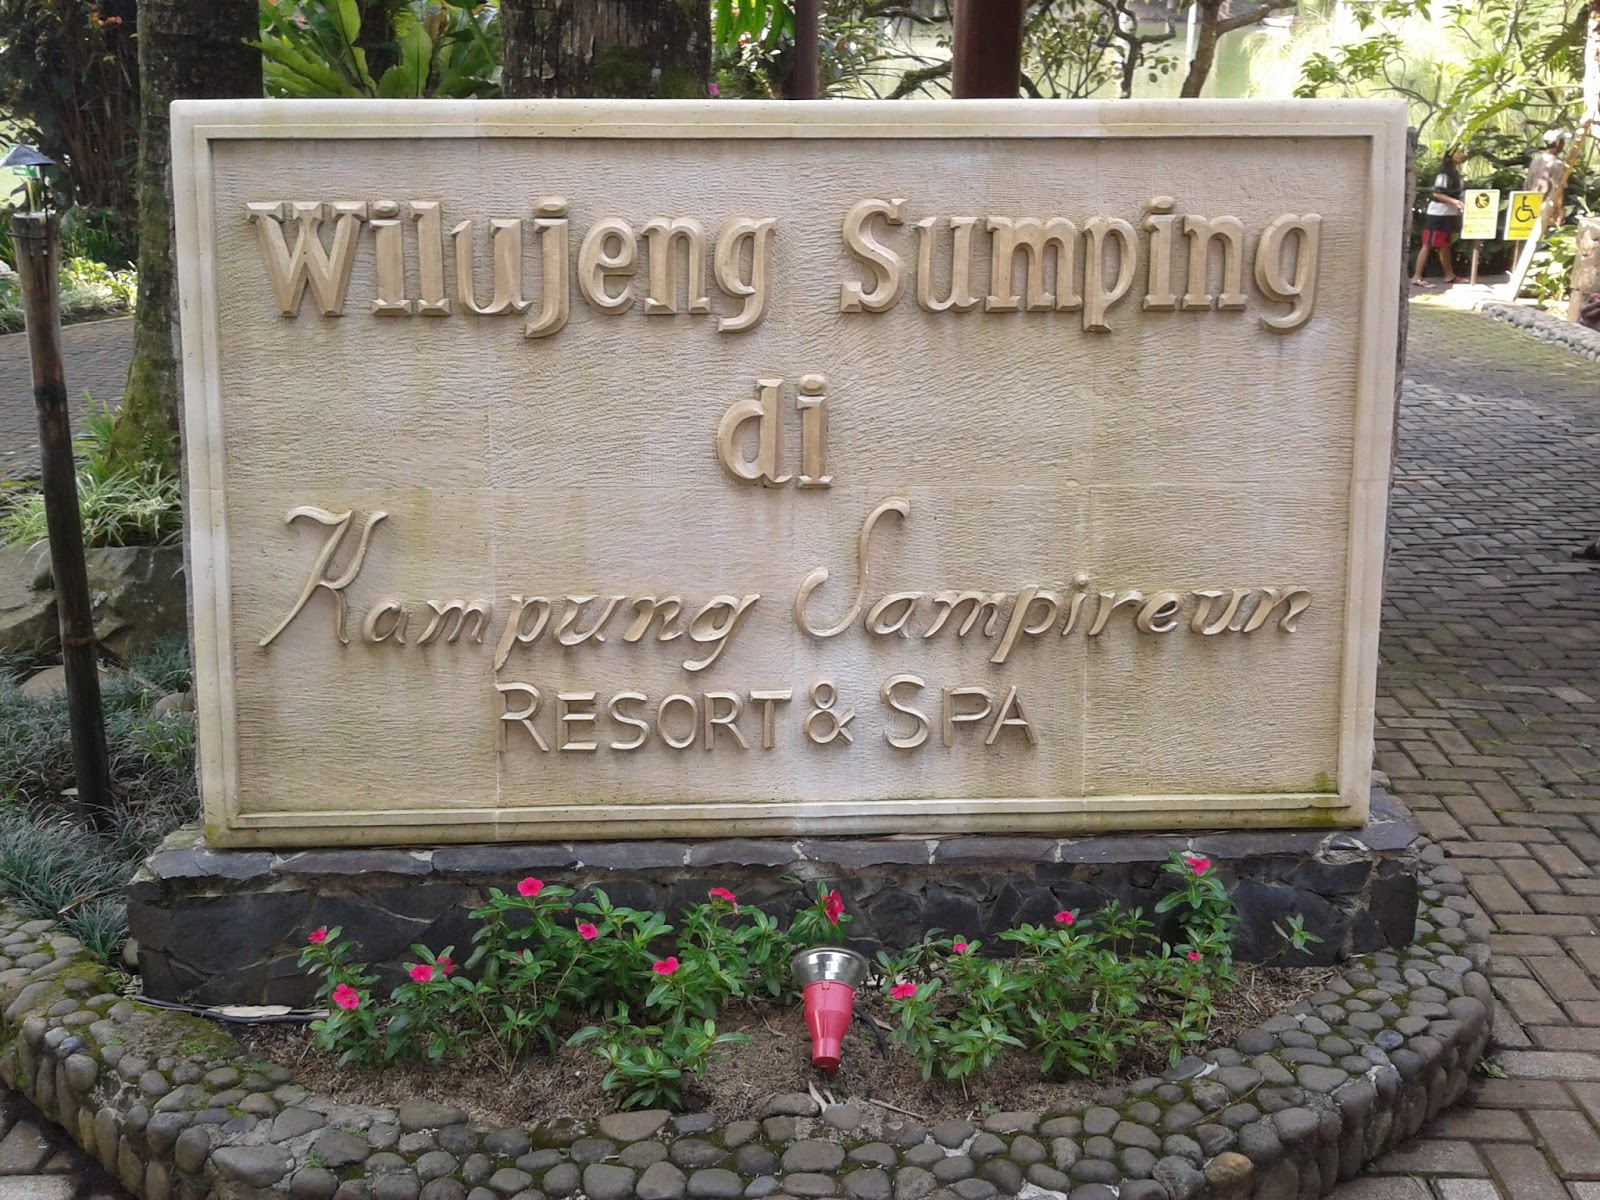 Kampung Sampireun, Favoritnya Wisata Keluarga di Garut - TheKepo